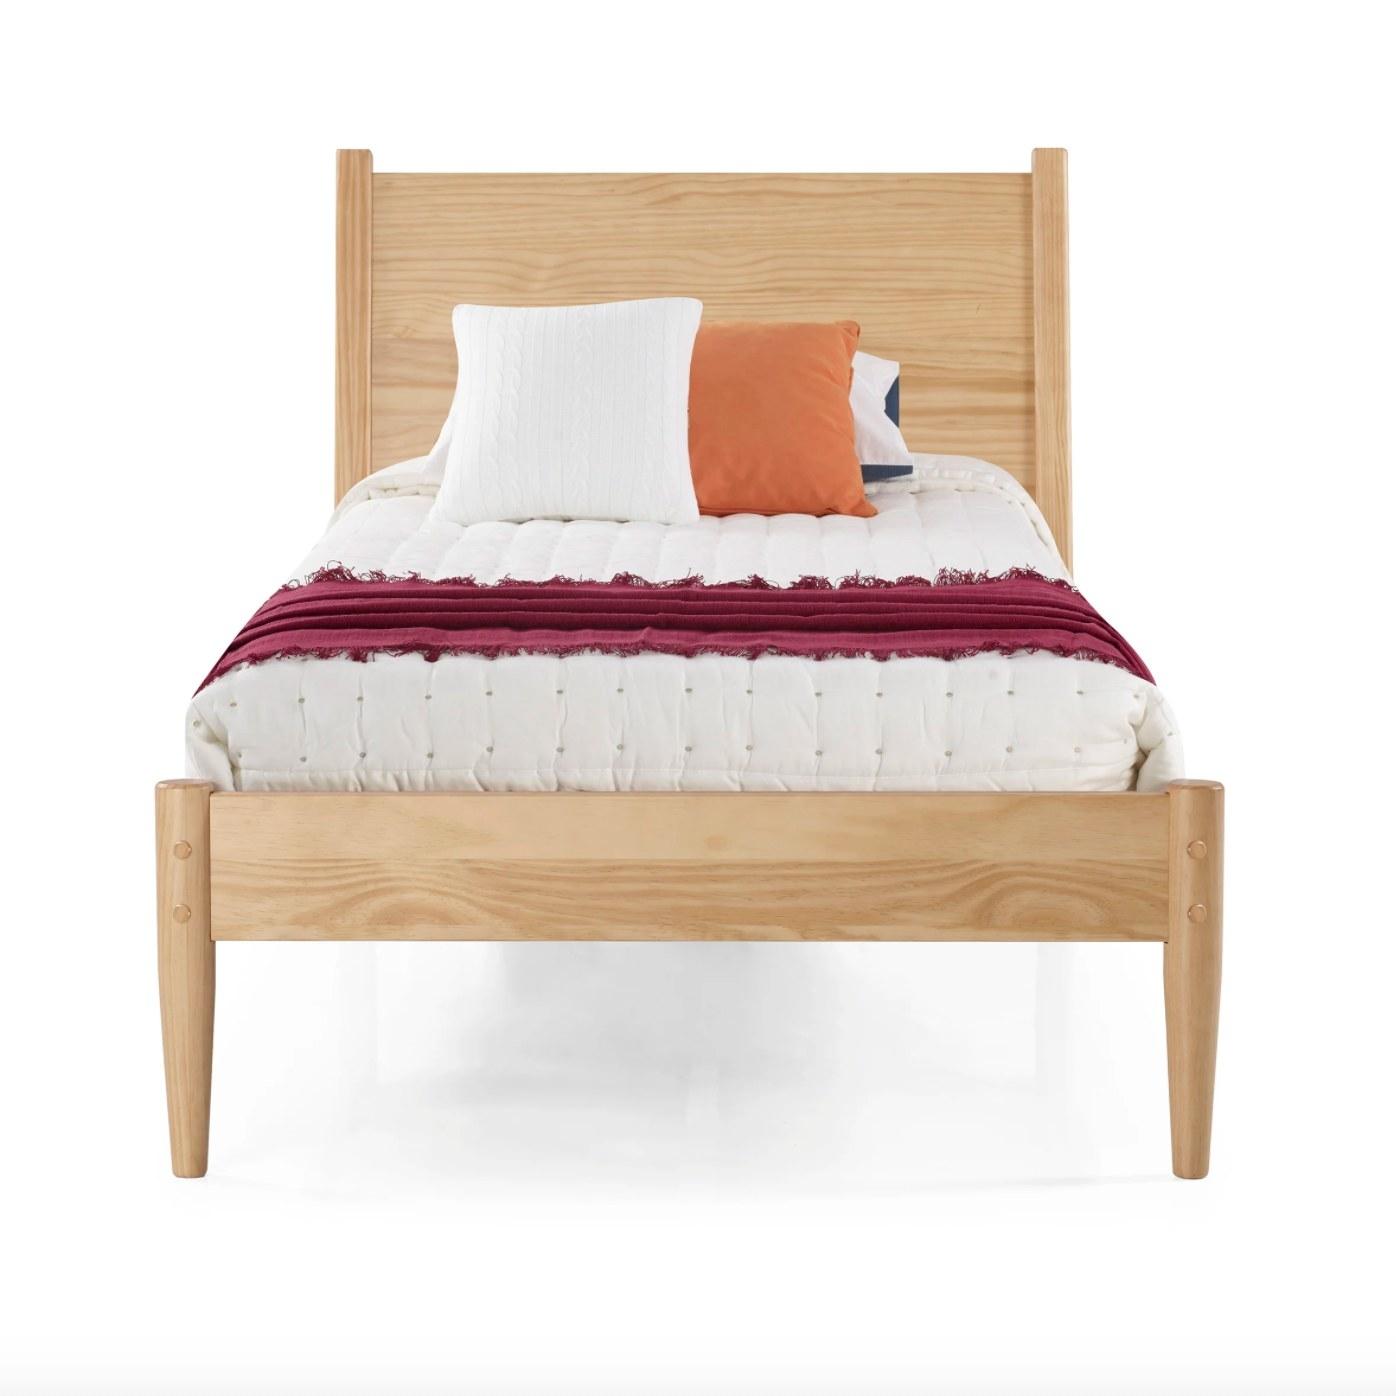 The platform wood bed frame in Scandinavian oak